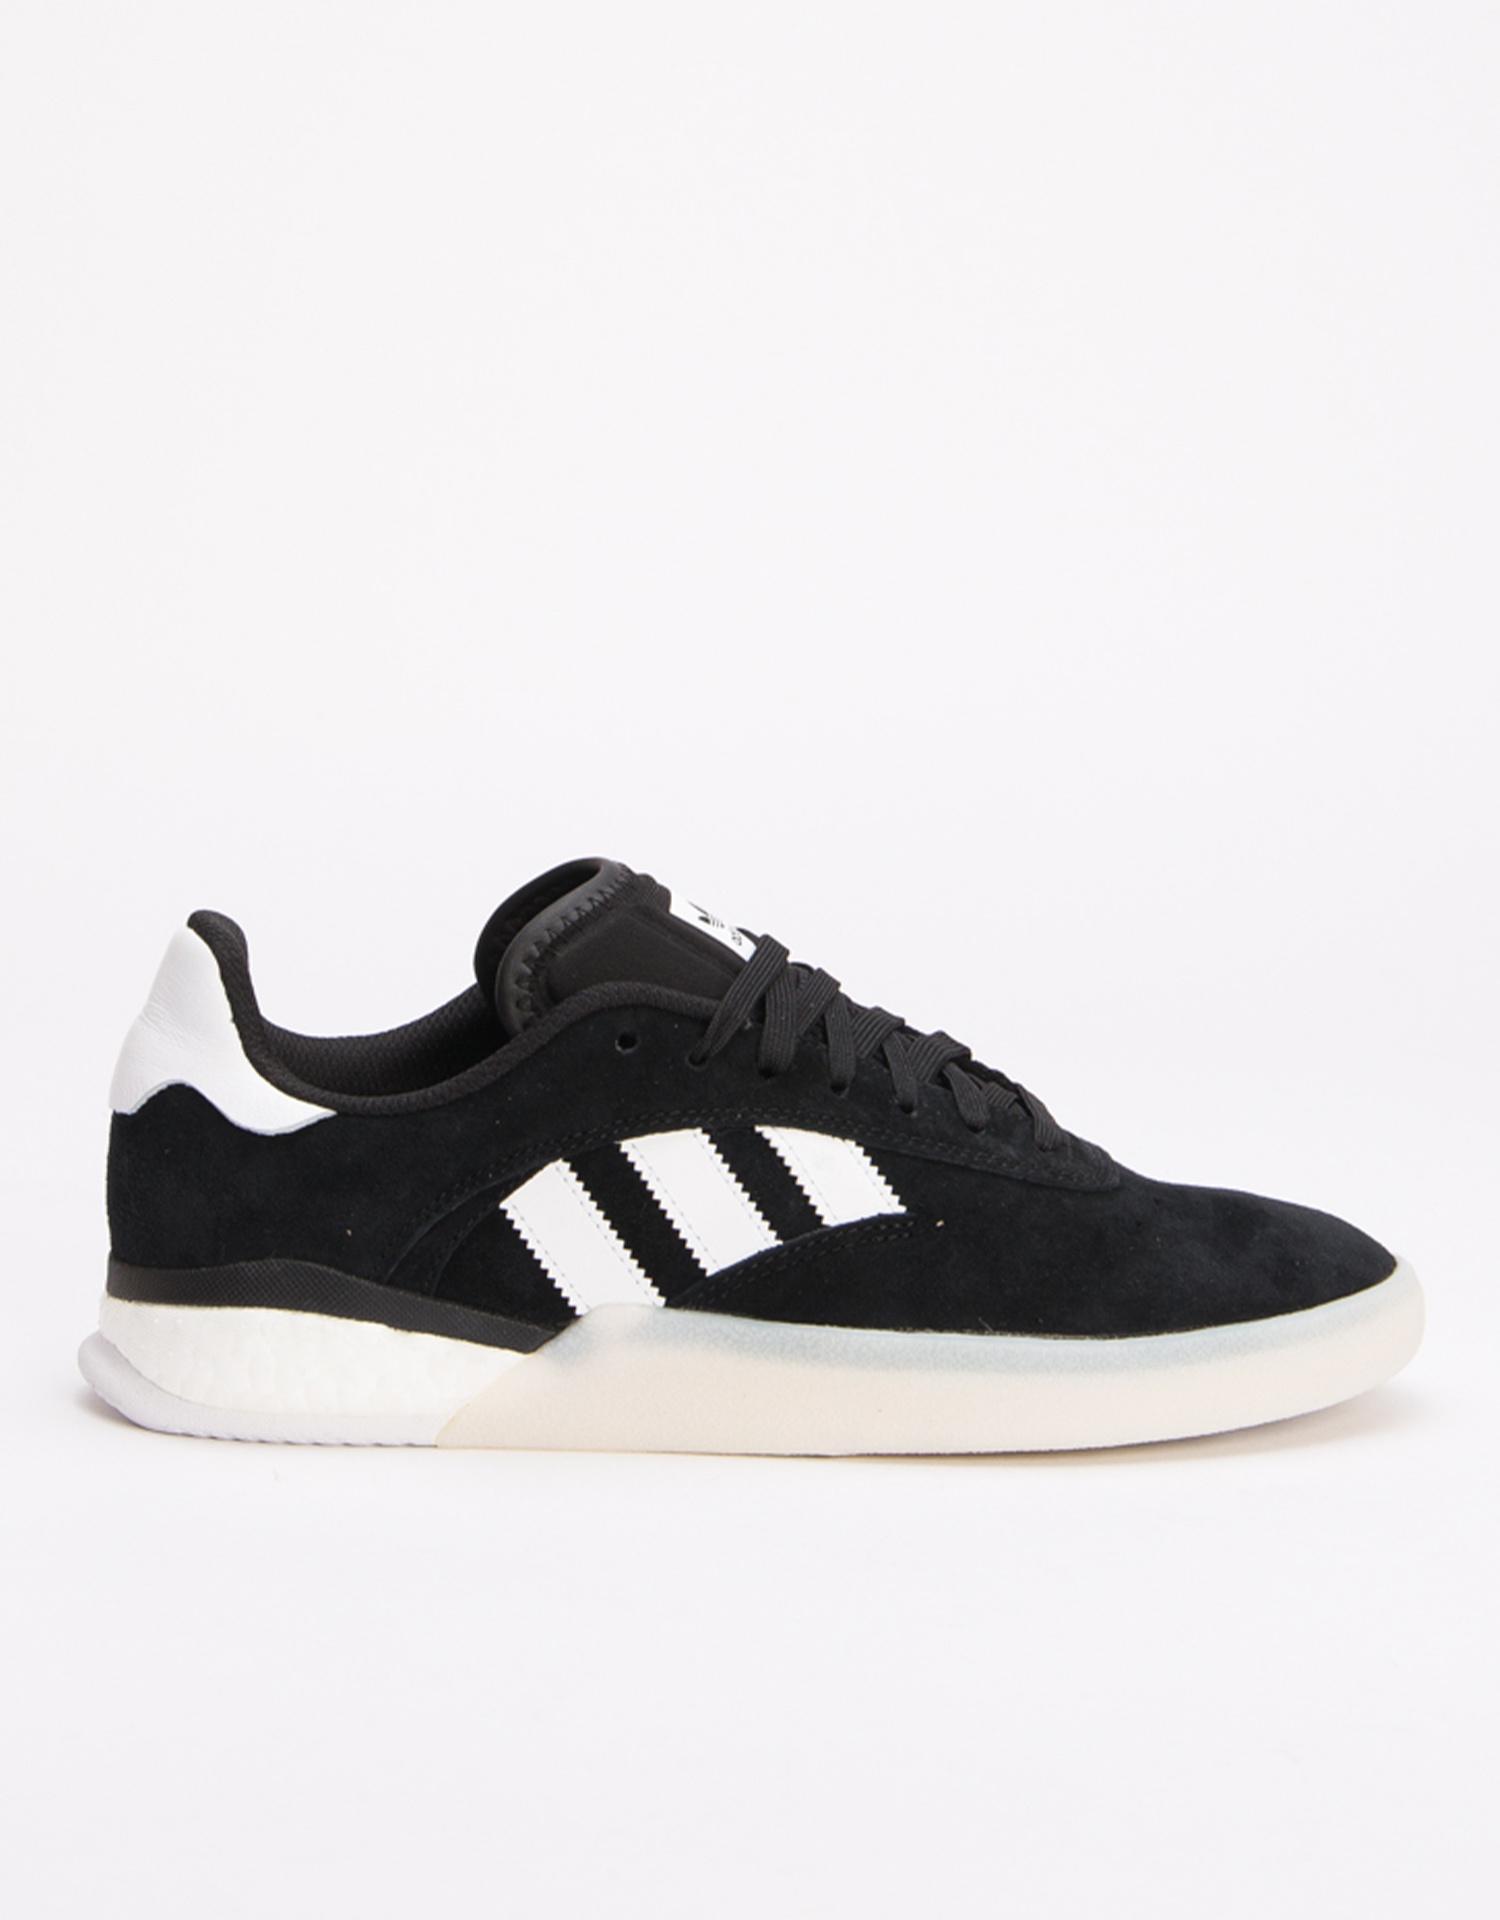 Adidas 3st.004 cblack/ftwwht/cblack